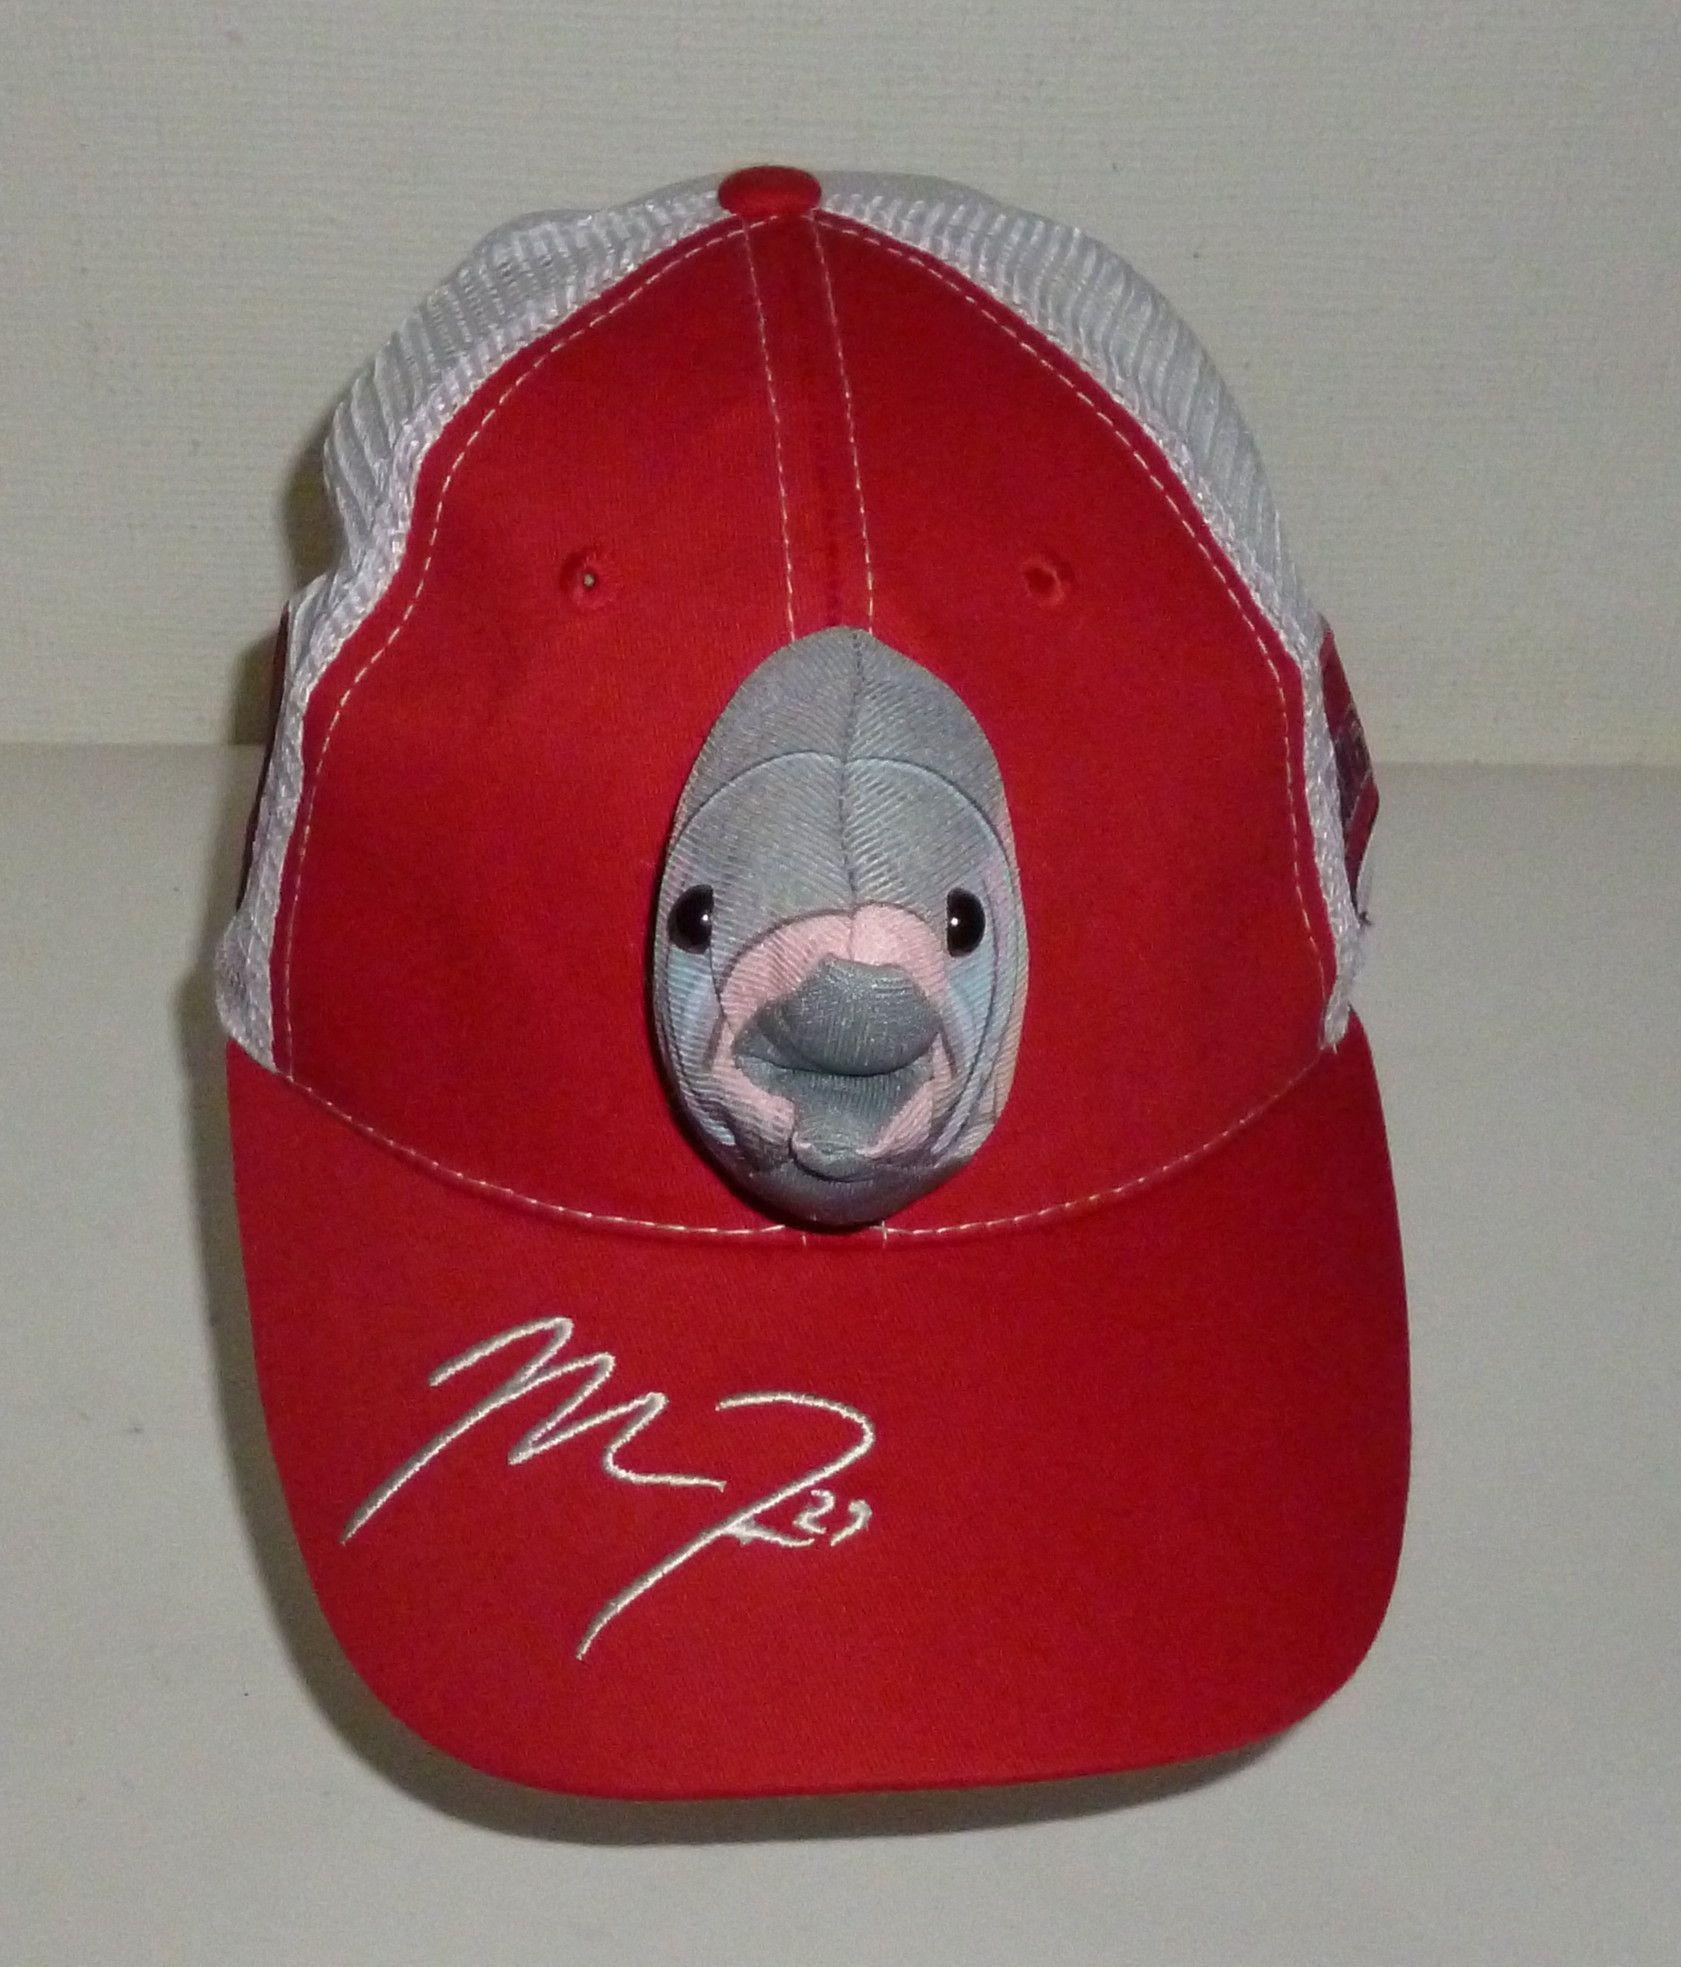 Mike Trout  27 Fish Head Angels MLB Baseball Cap Hat  34fc54d654c